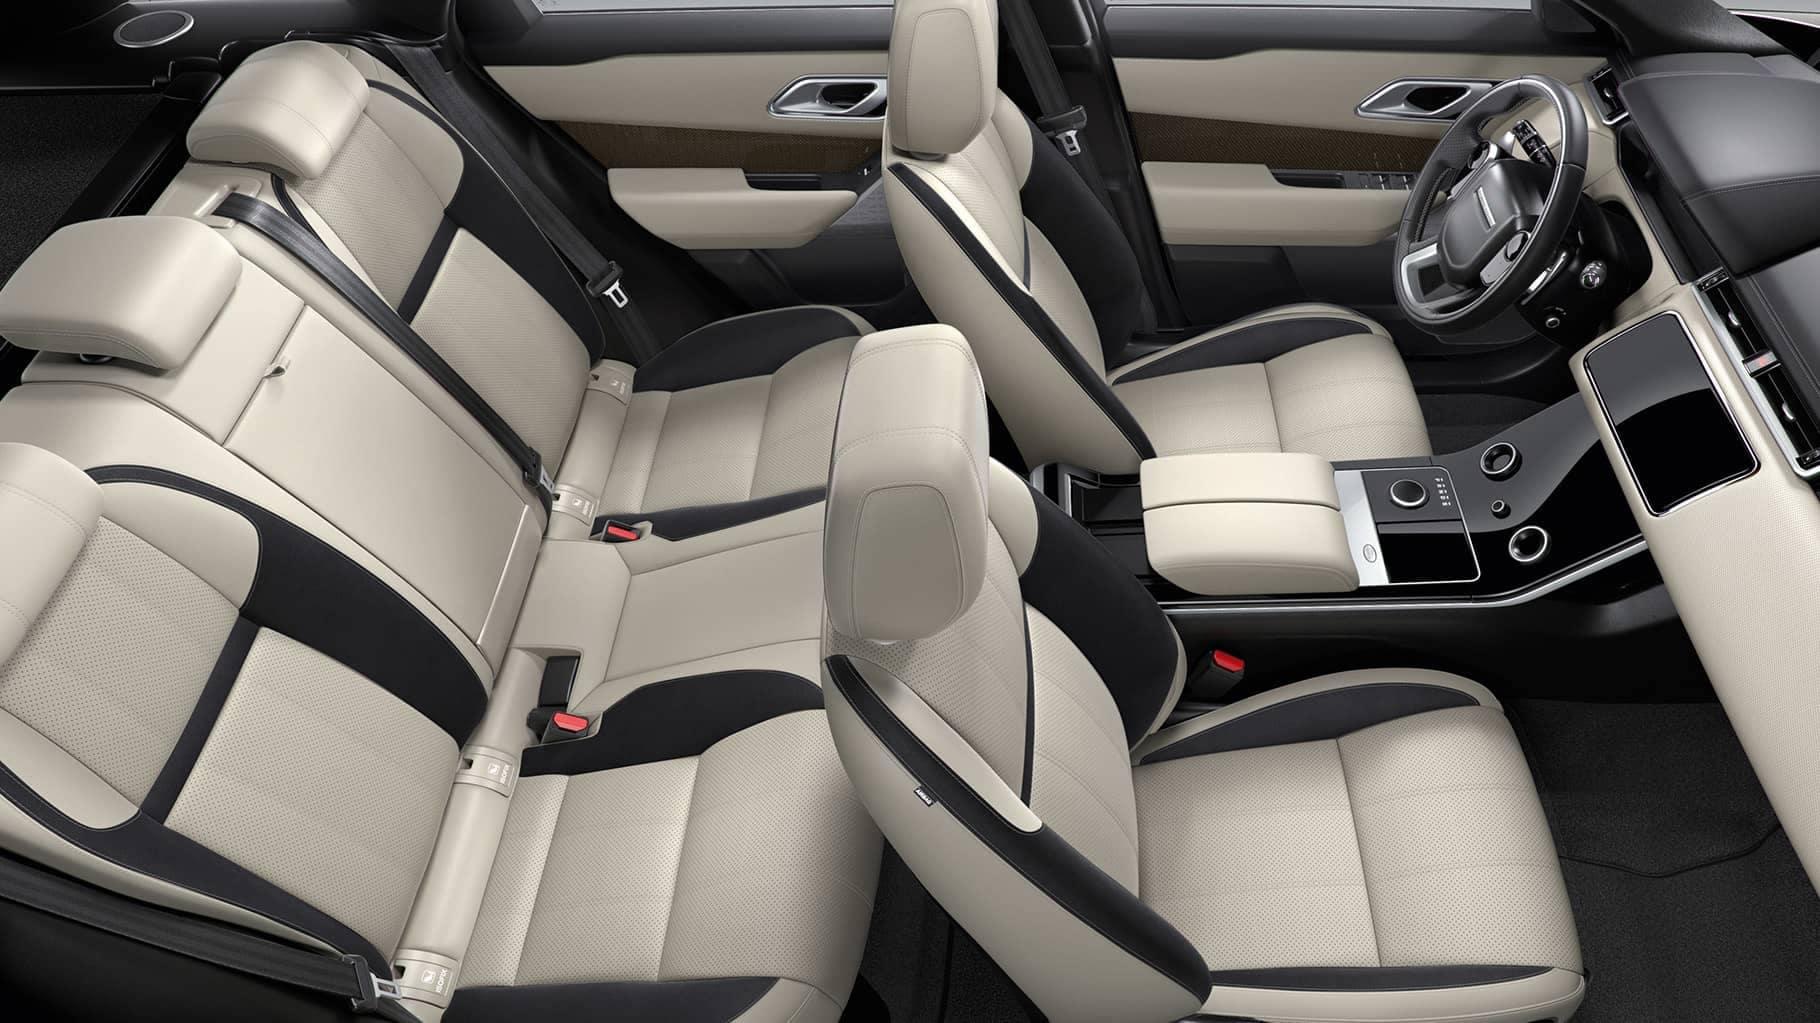 2019 Land Rover Range Rover Velar Interior Seating